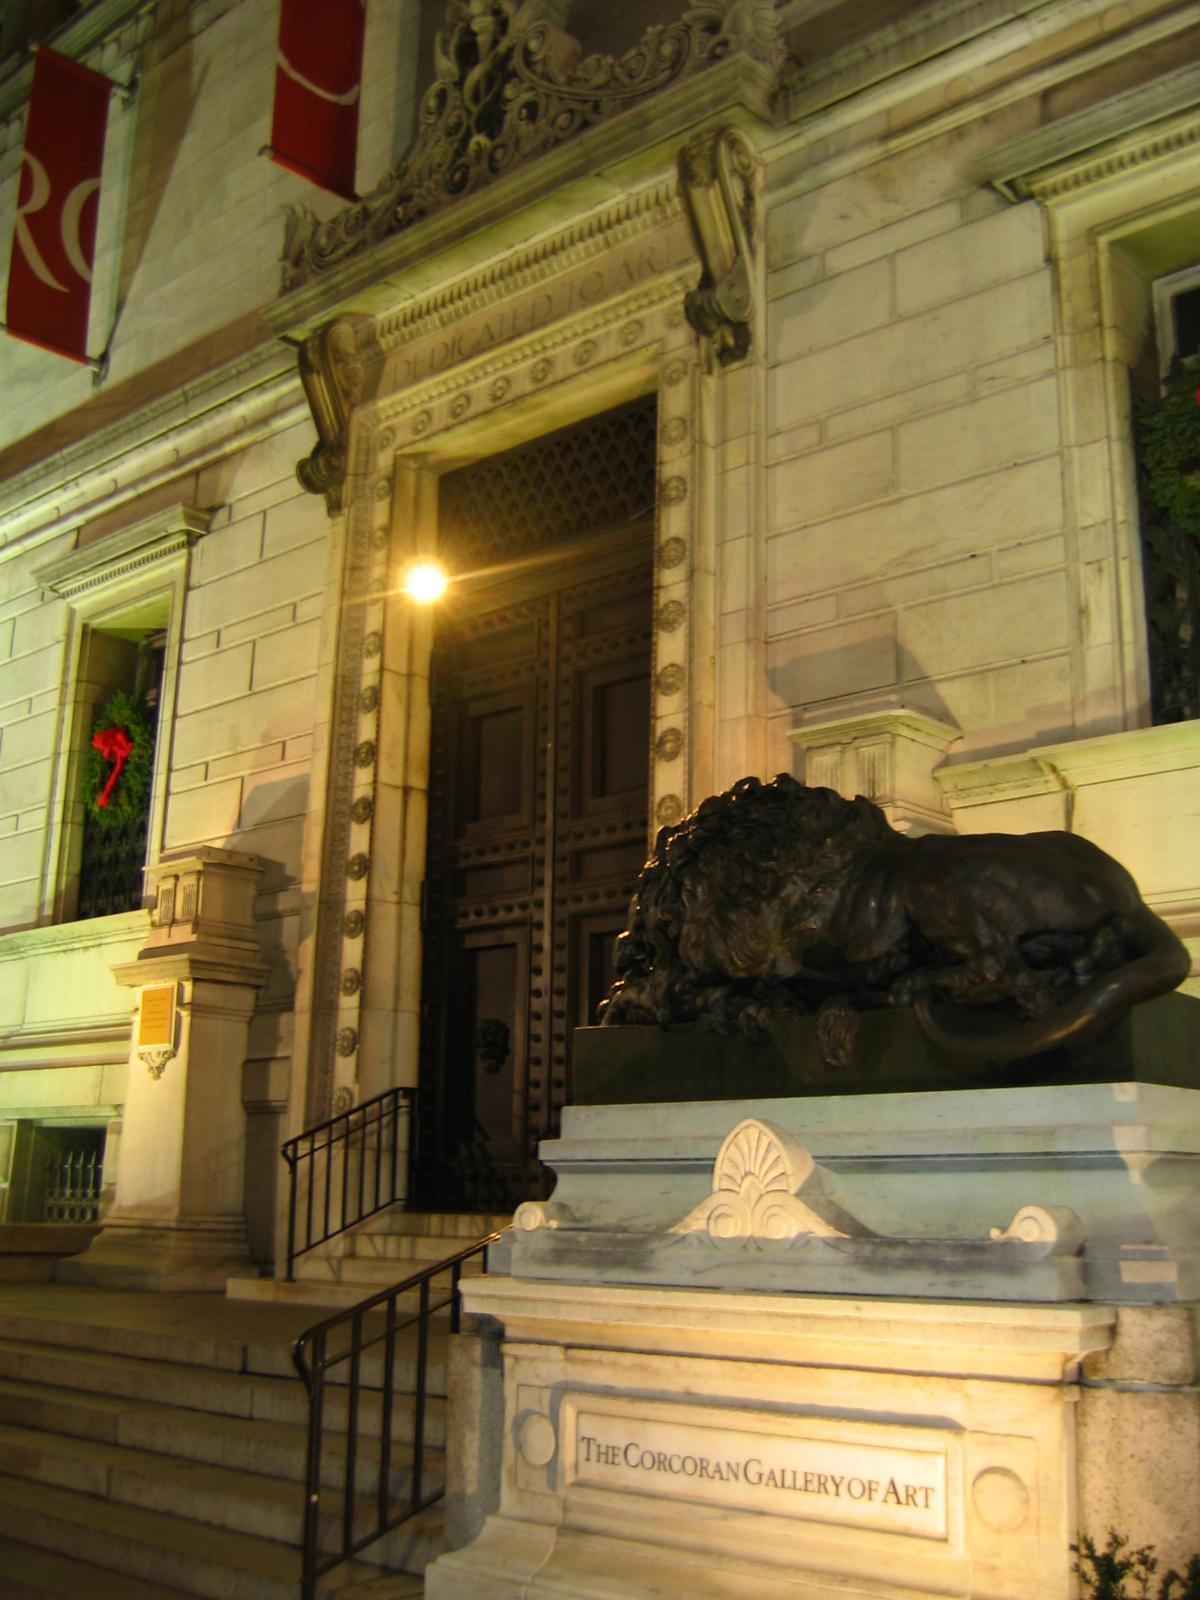 Corcoran Gallery of Art s 1869 Society - Washington, United States 1869 society corcoran gallery